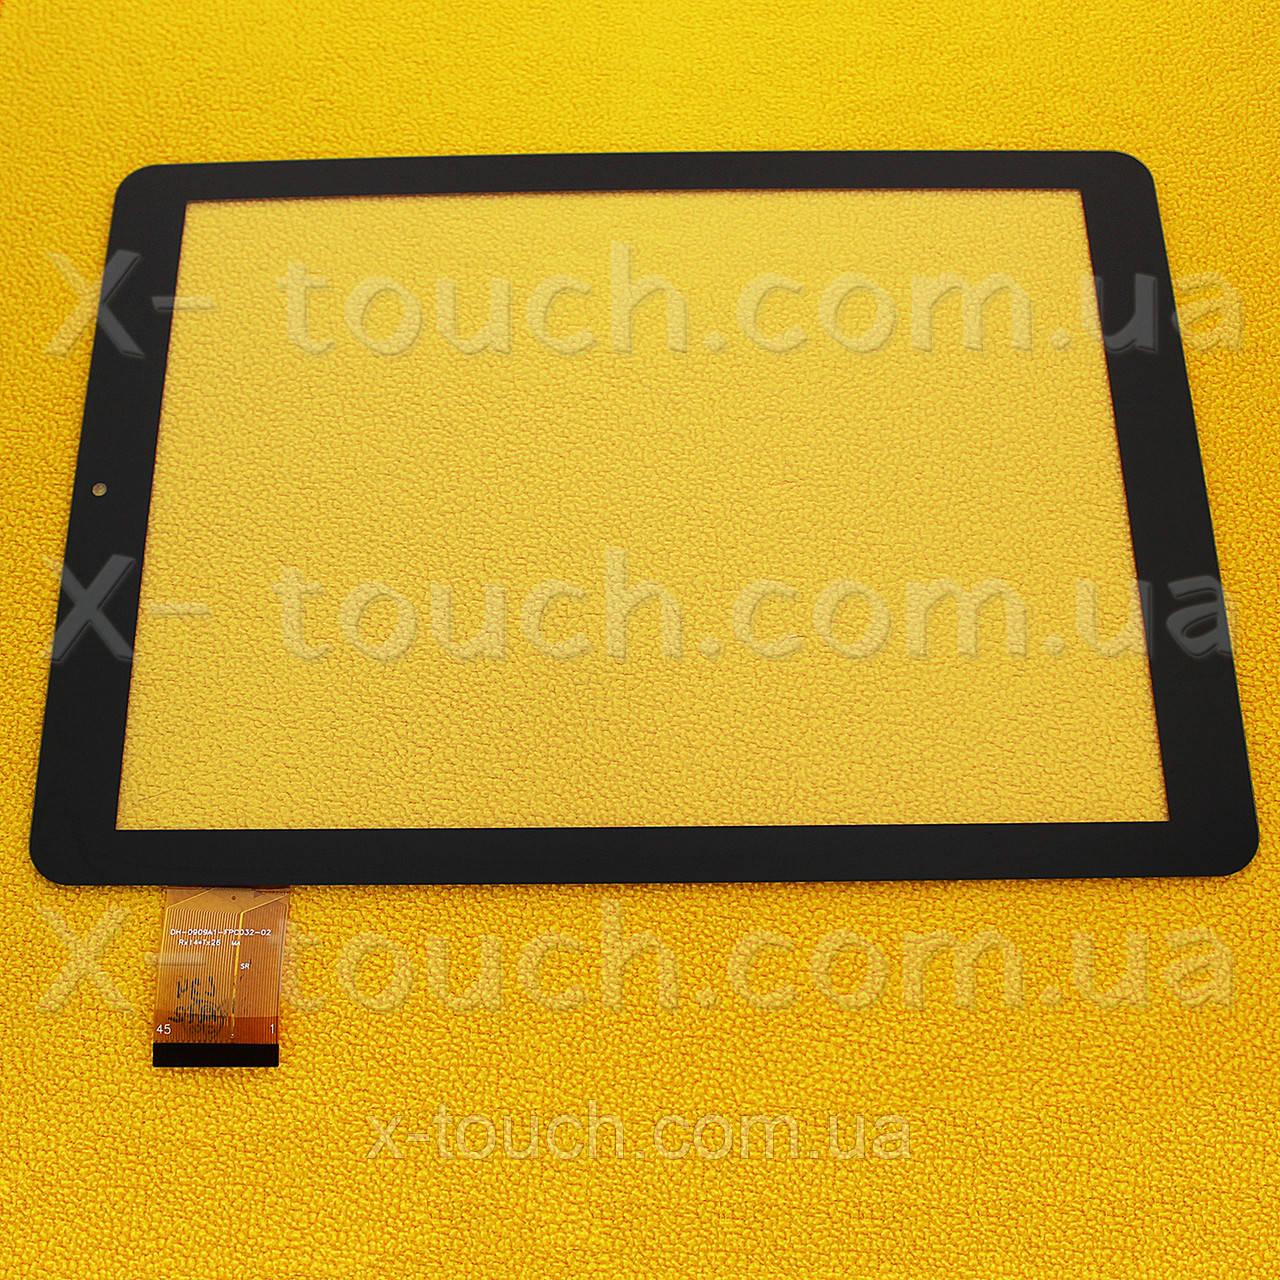 Тачскрин, сенсор  DH-0909A1-FPC032-02  для планшета